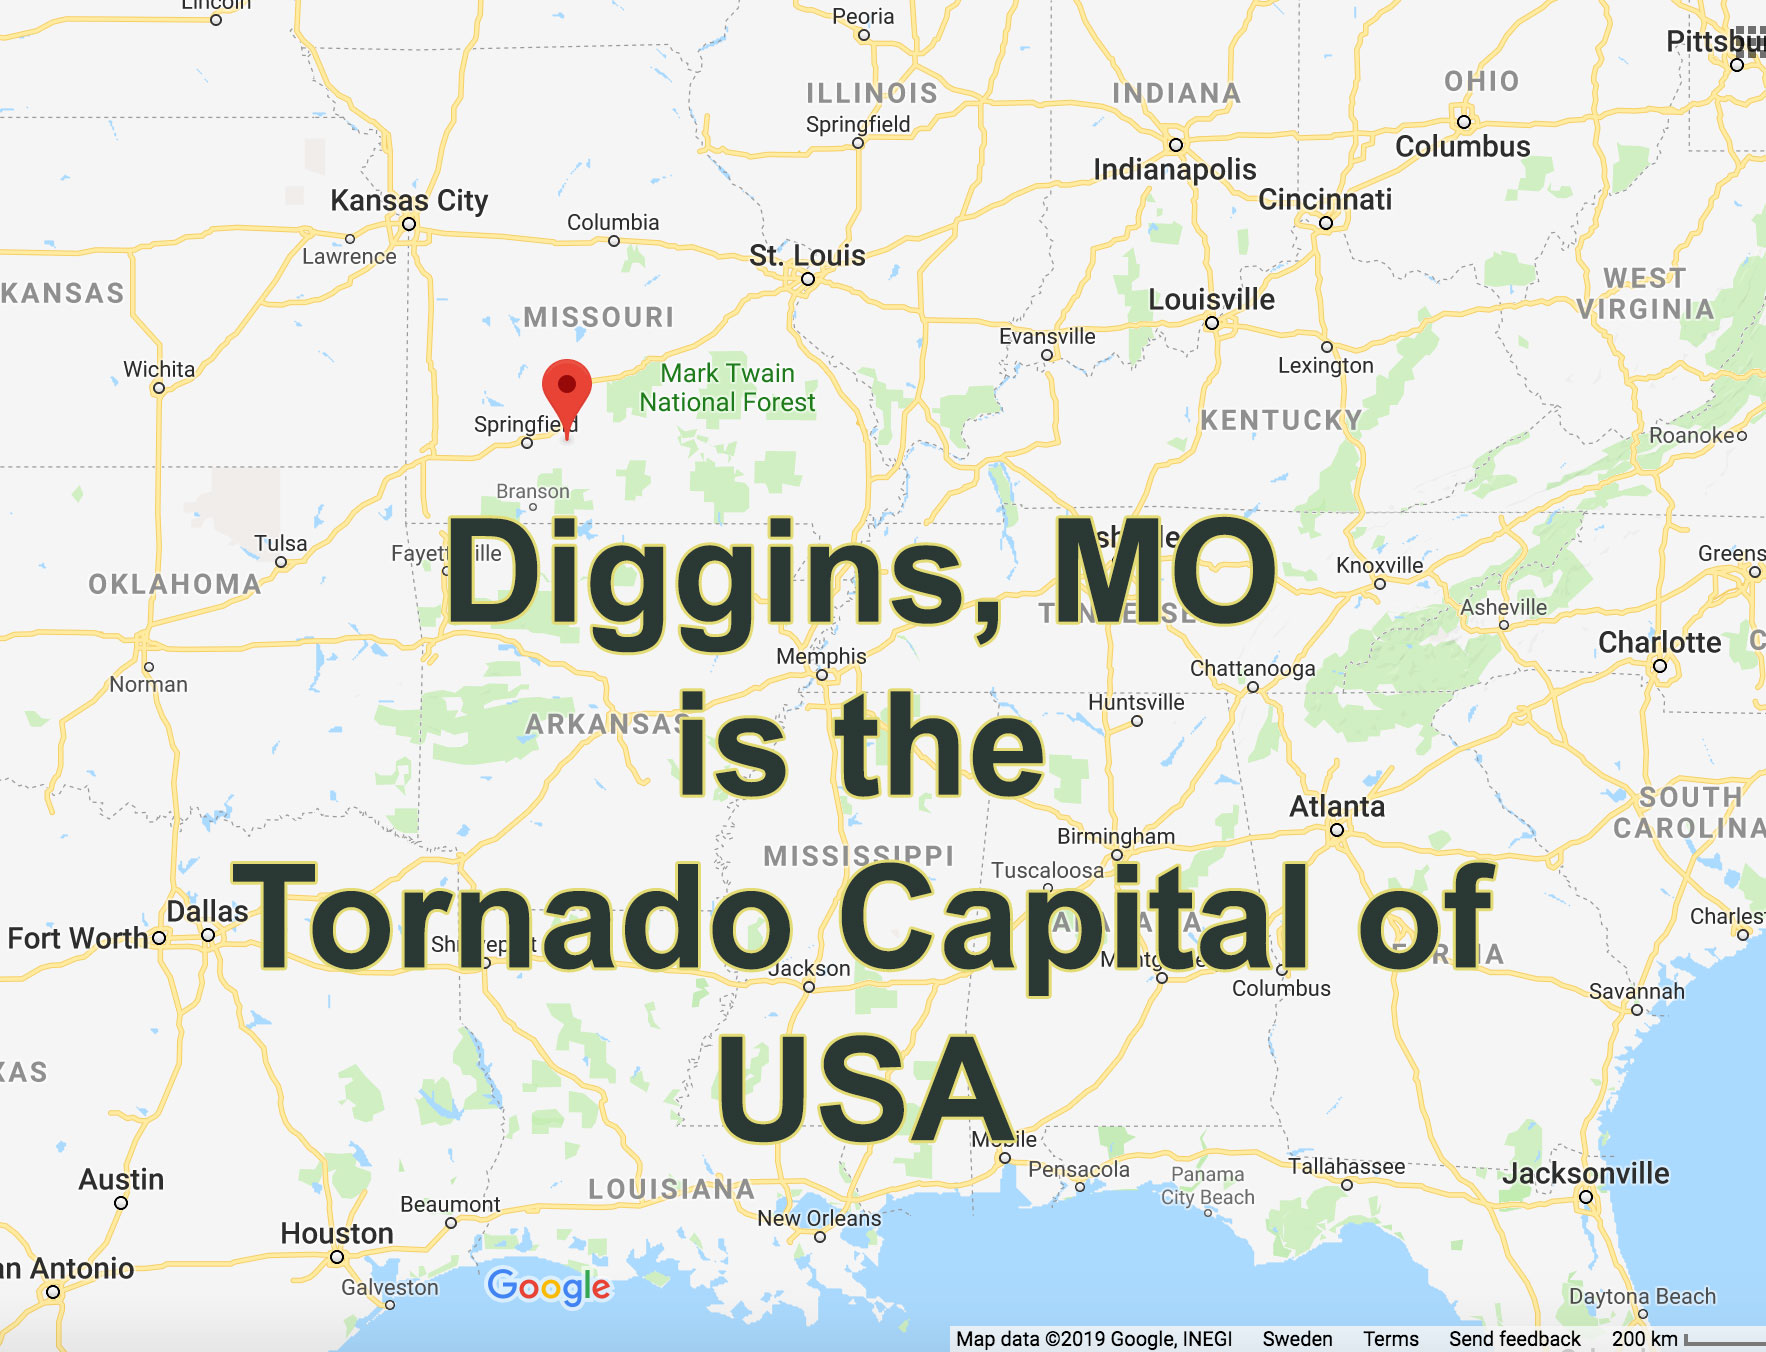 diggins missouri tornado capital